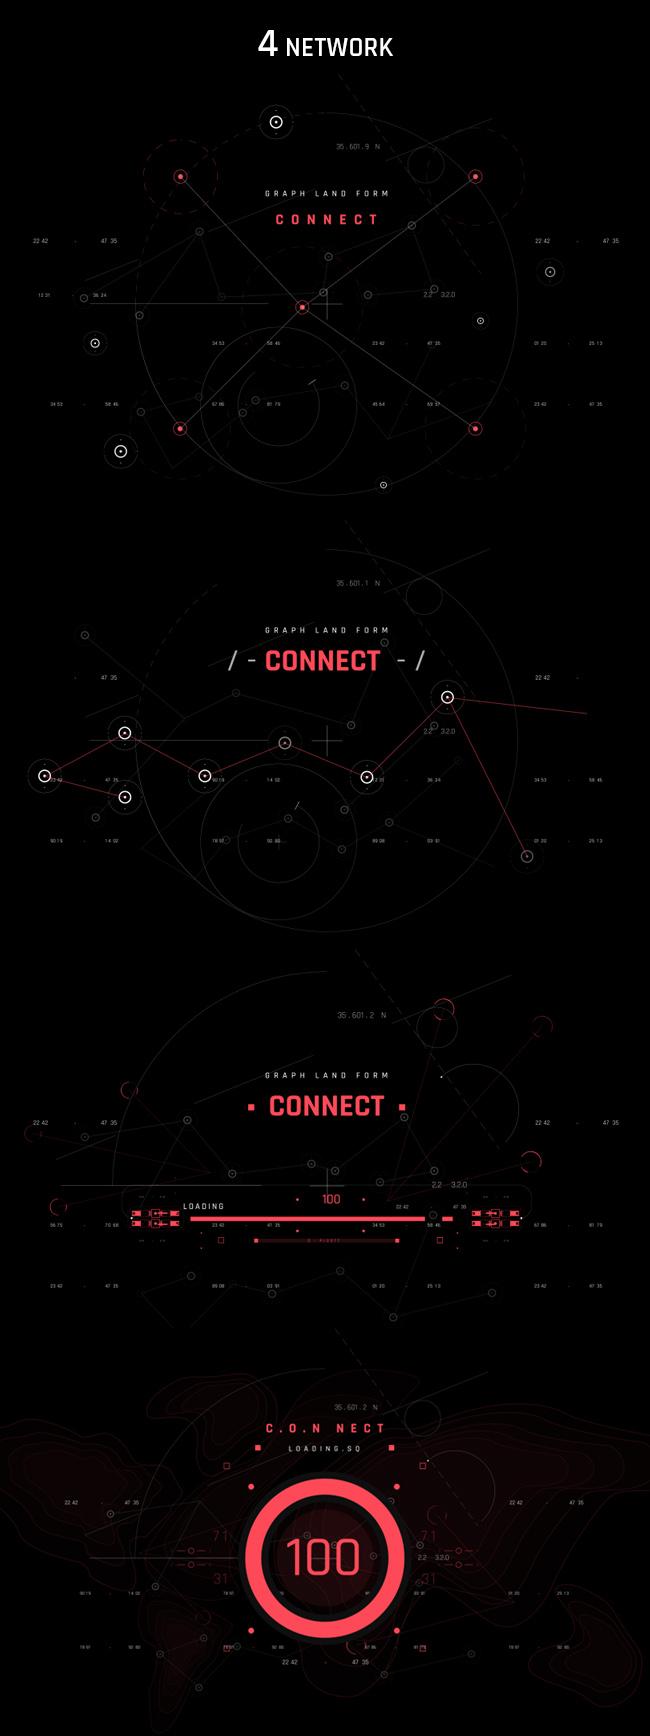 AE脚本-500个HUD高科技赛博朋克UI科幻界面元素动画预设包 Cyberpunk HUD UI 500+ 已修复中文版AE表达式报错插图40